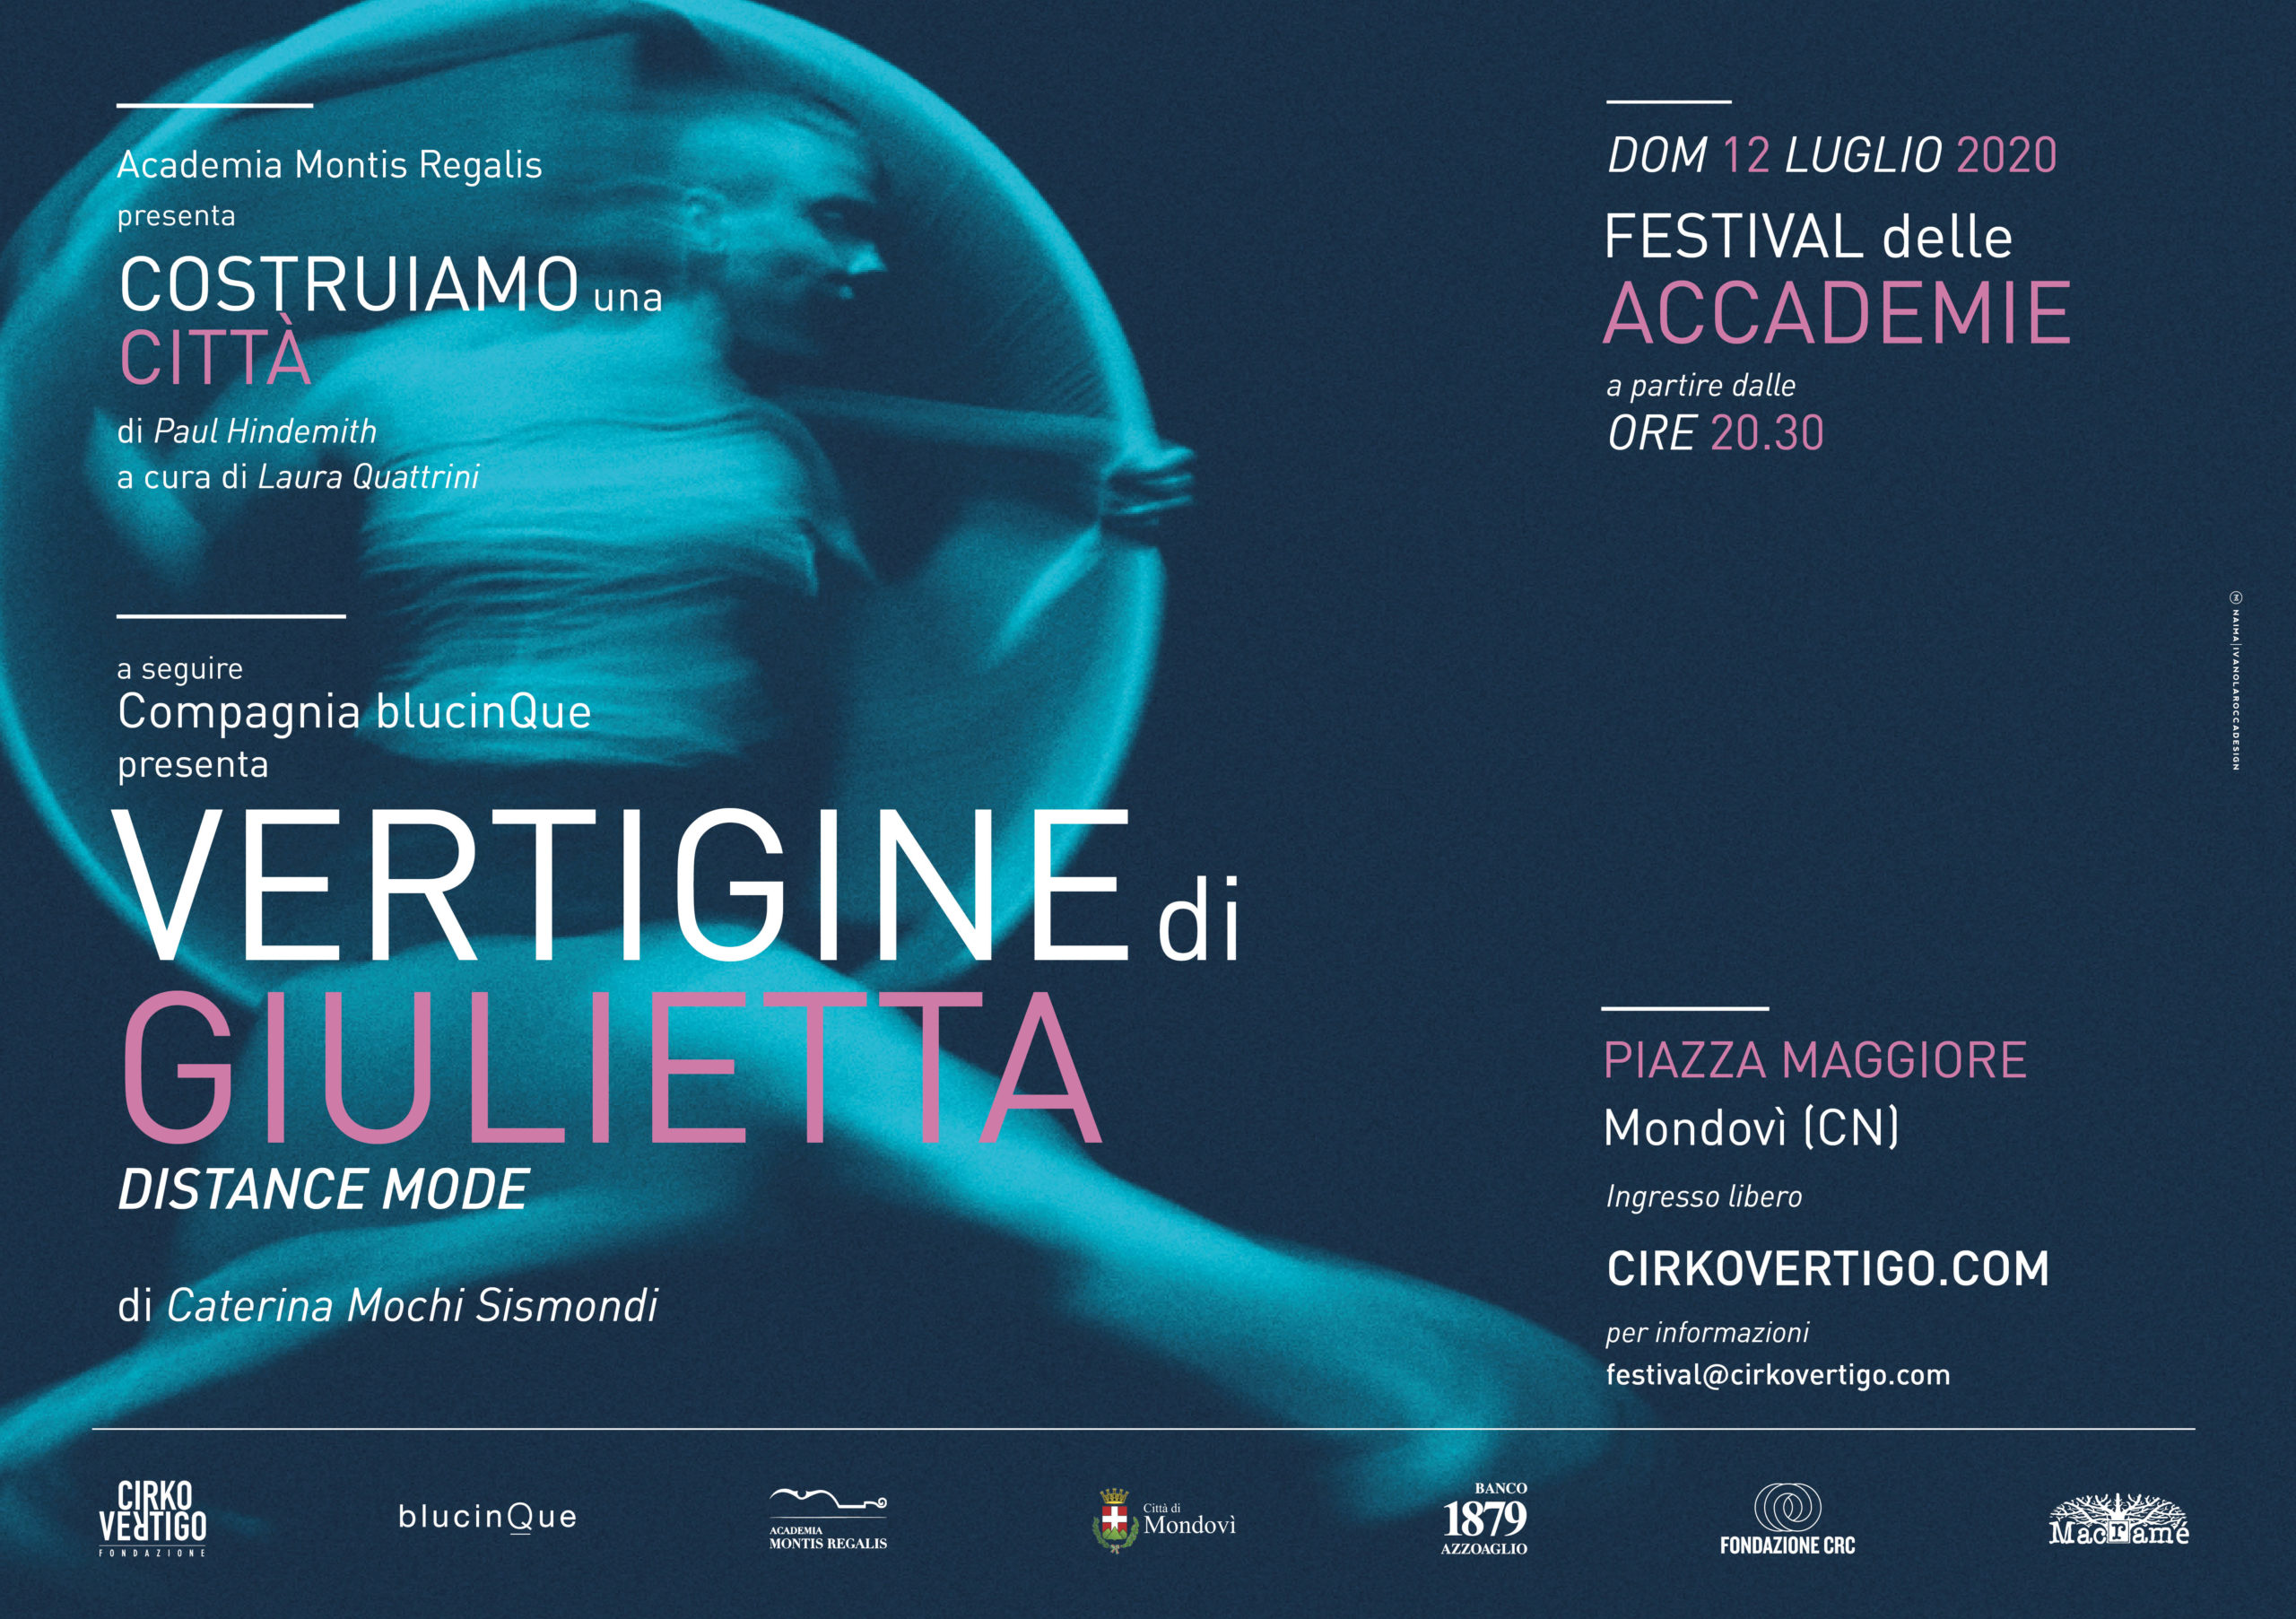 Vertigine di Giulietta – Distance mode / blucinQue - Card Mondovì